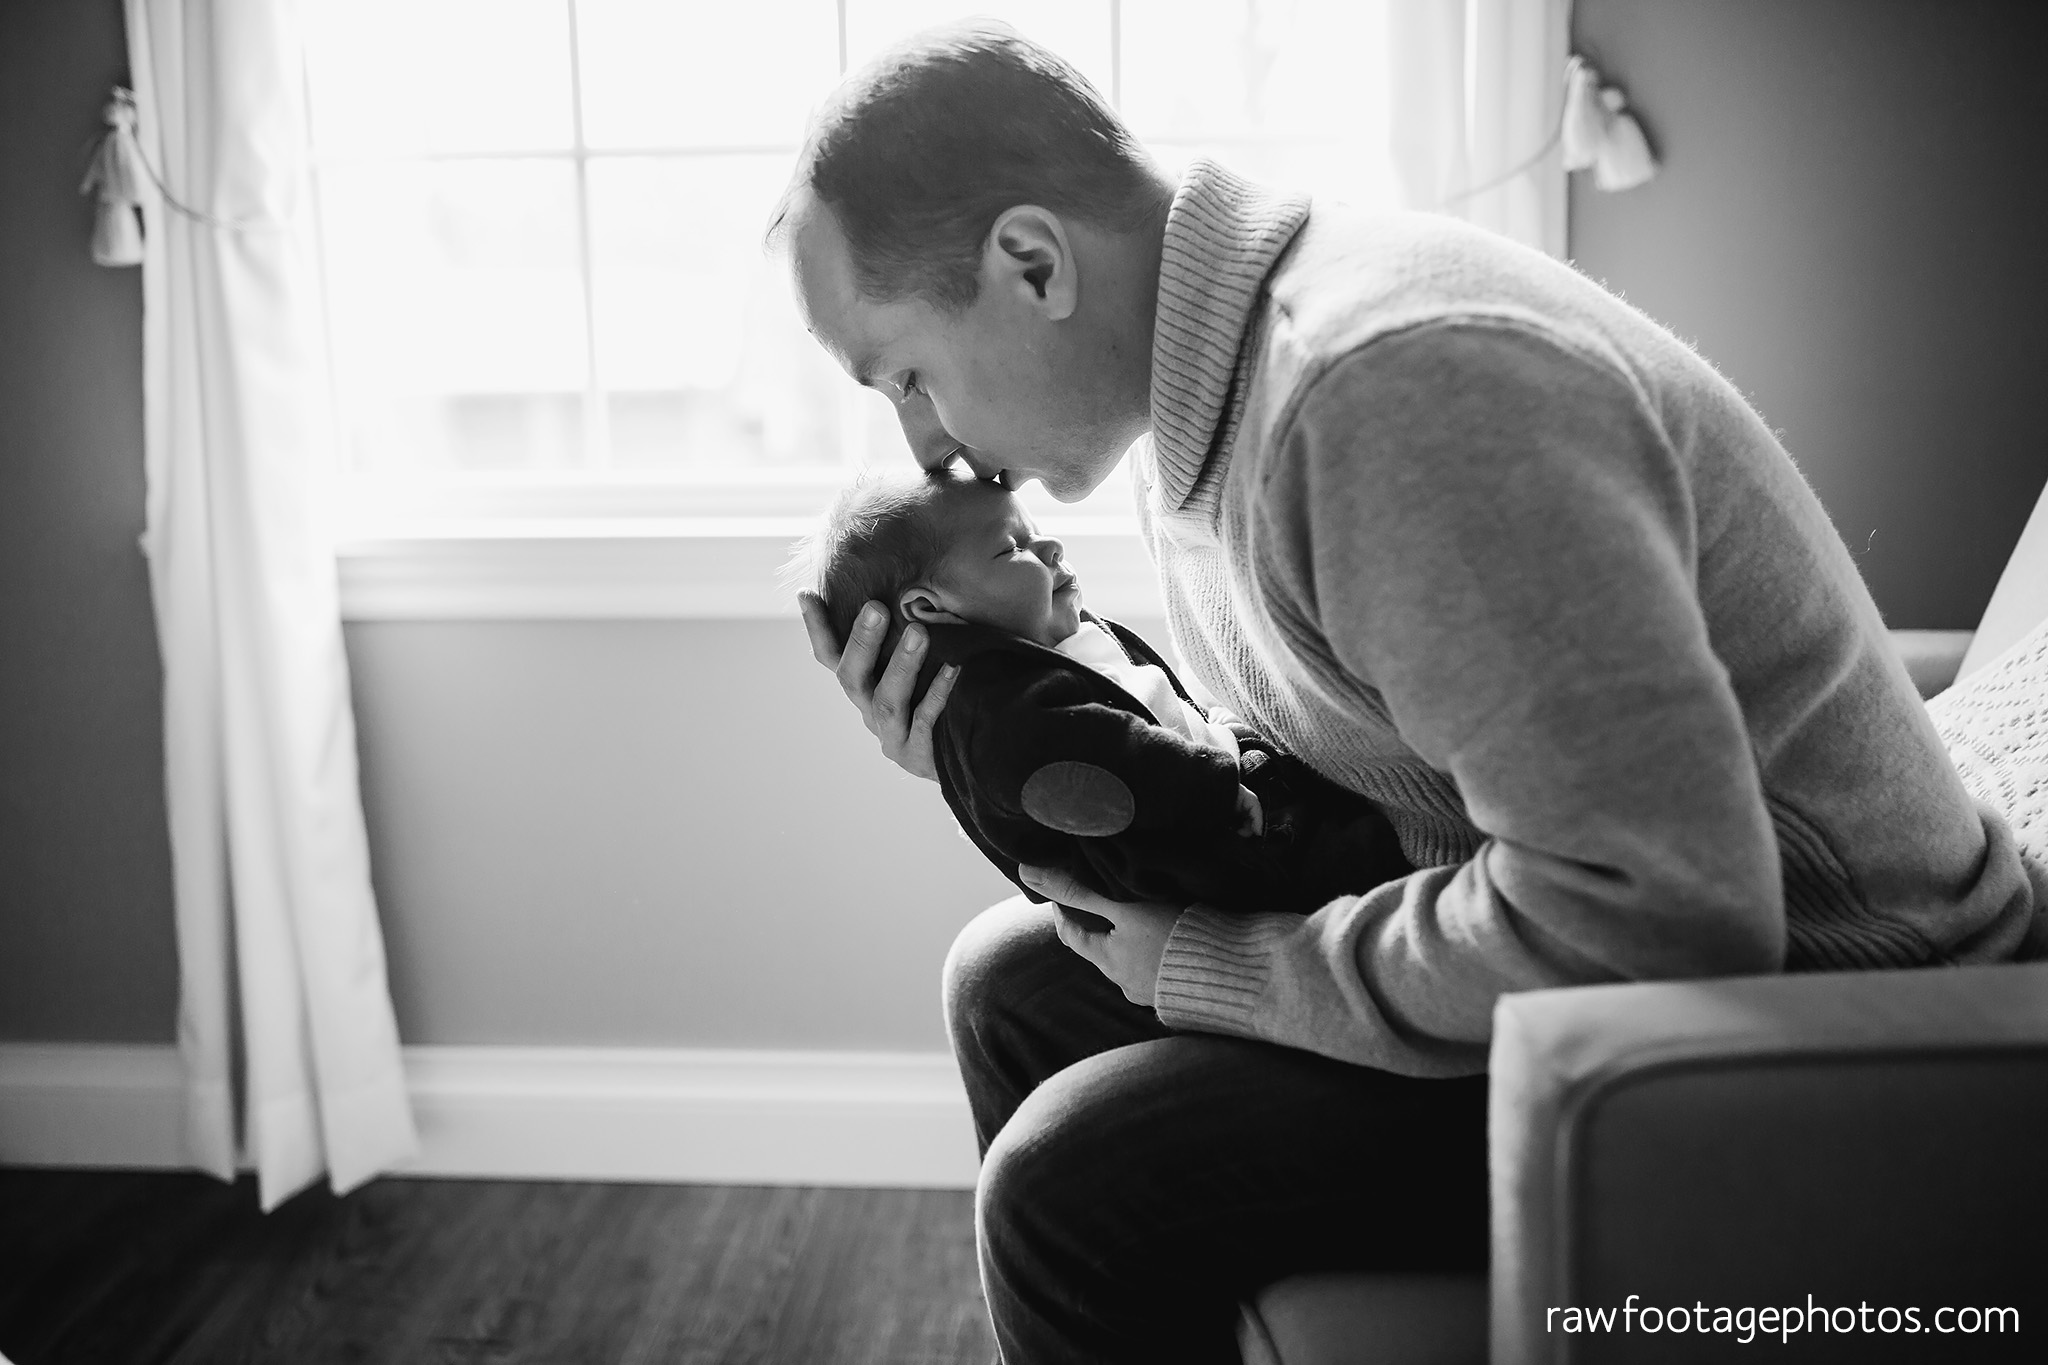 london_ontario_newborn_lifestyle_photographer-best_of_2018-raw_footage_photography010.jpg